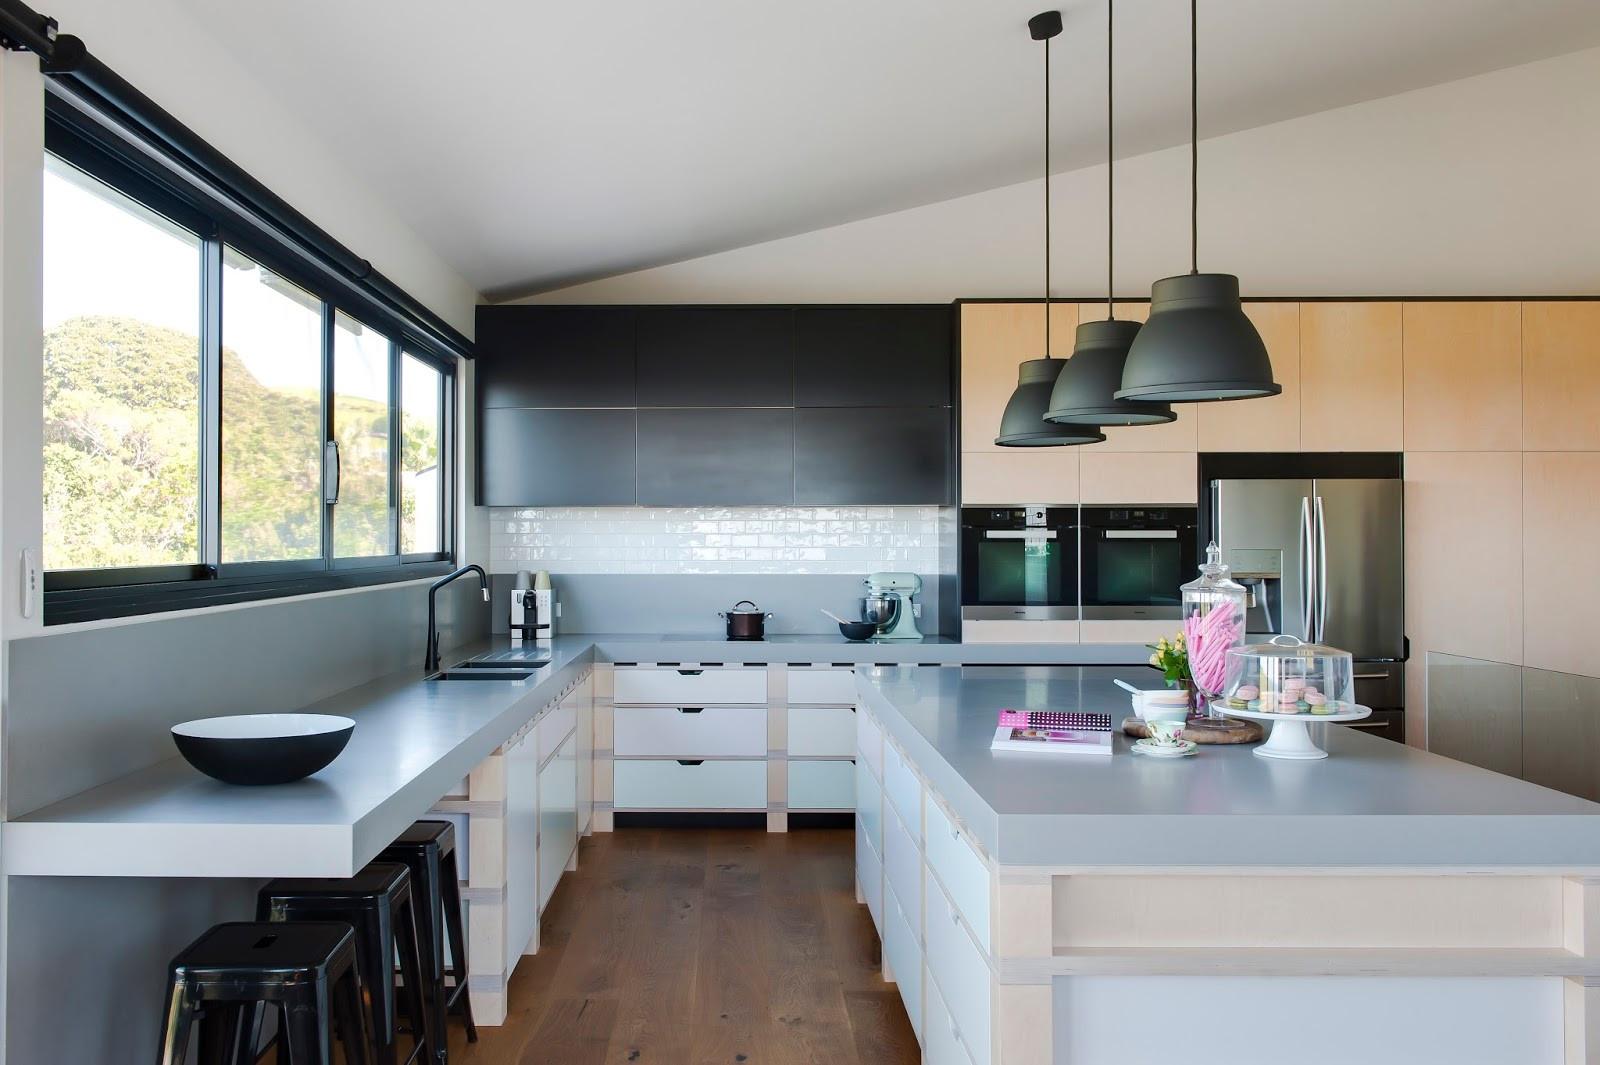 Best ideas about Unique Kitchen Ideas . Save or Pin Minosa A unique kitchen design solution based on a palette Now.